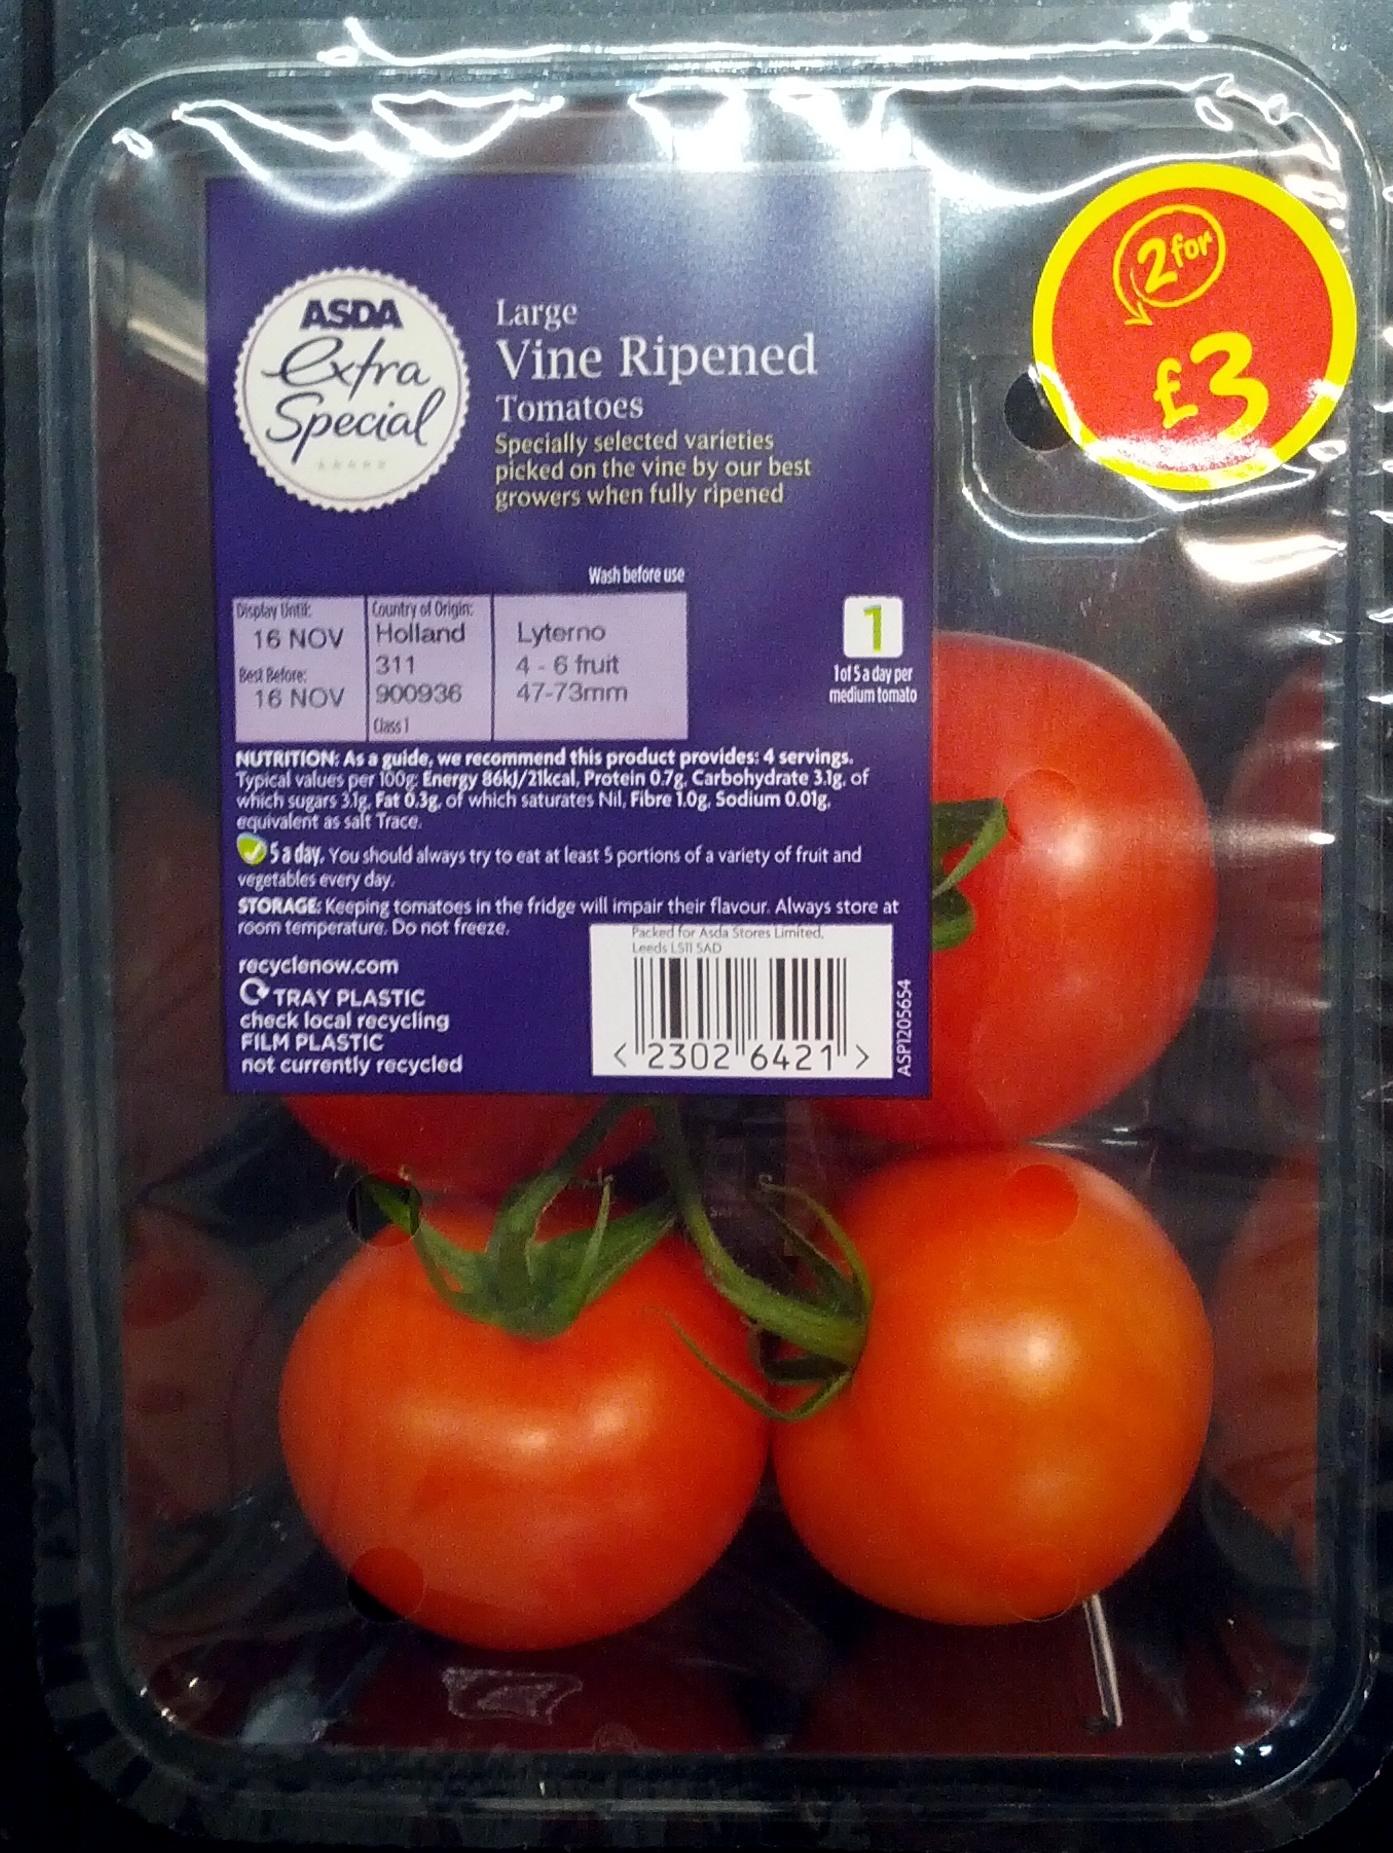 Large Vine Ripened Tomatoes - Produit